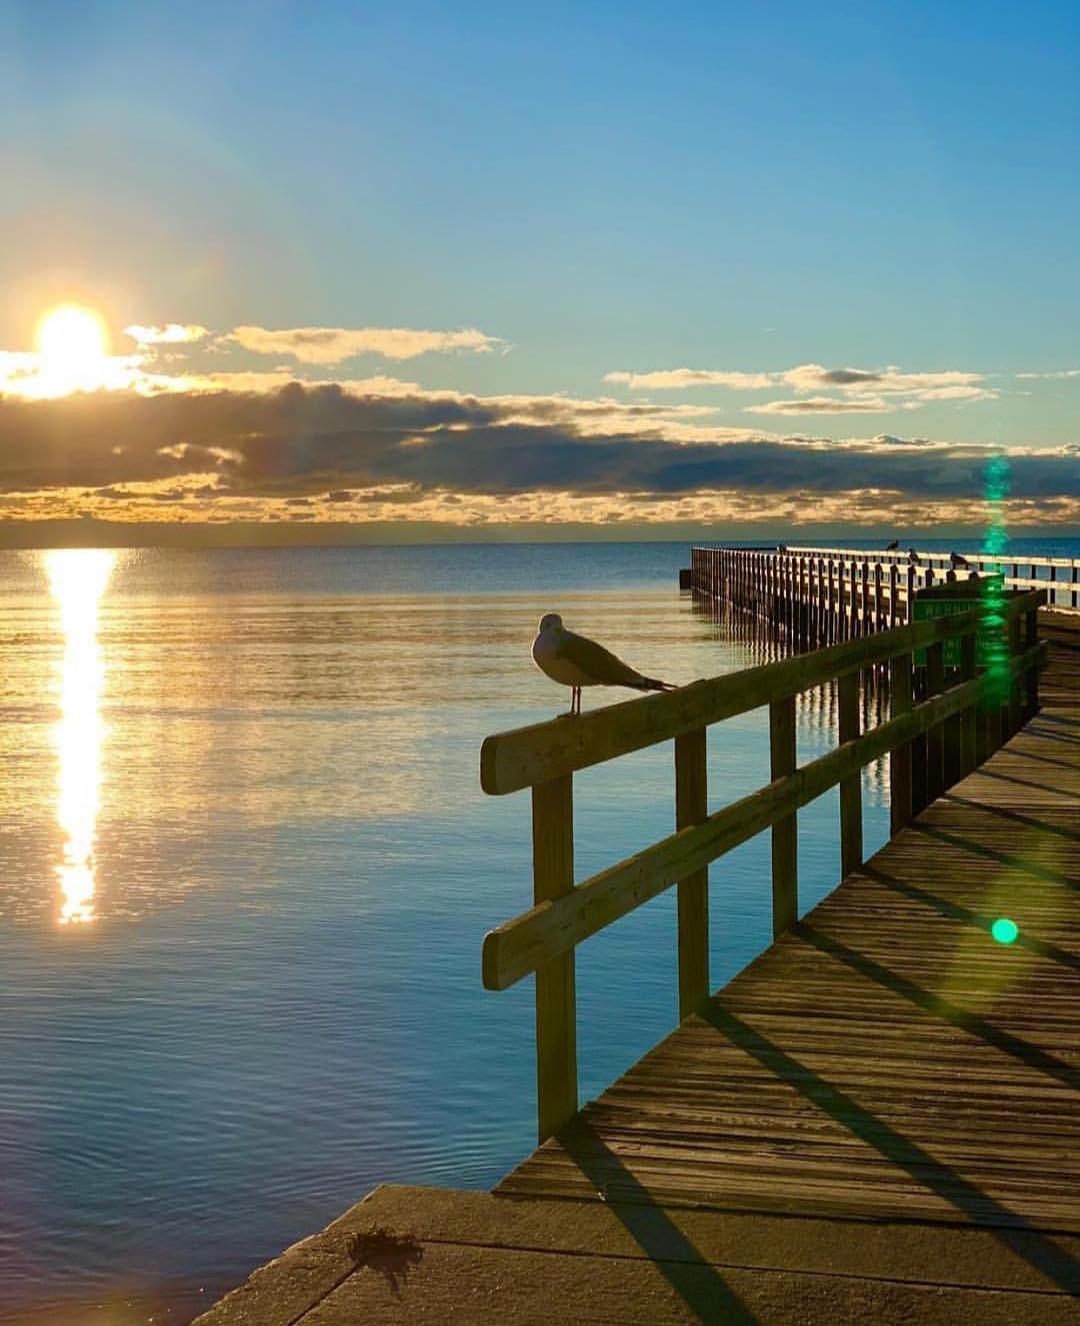 Autumn Mornings on Blair Street Pier. Photo by Justin Christensen Cooper.